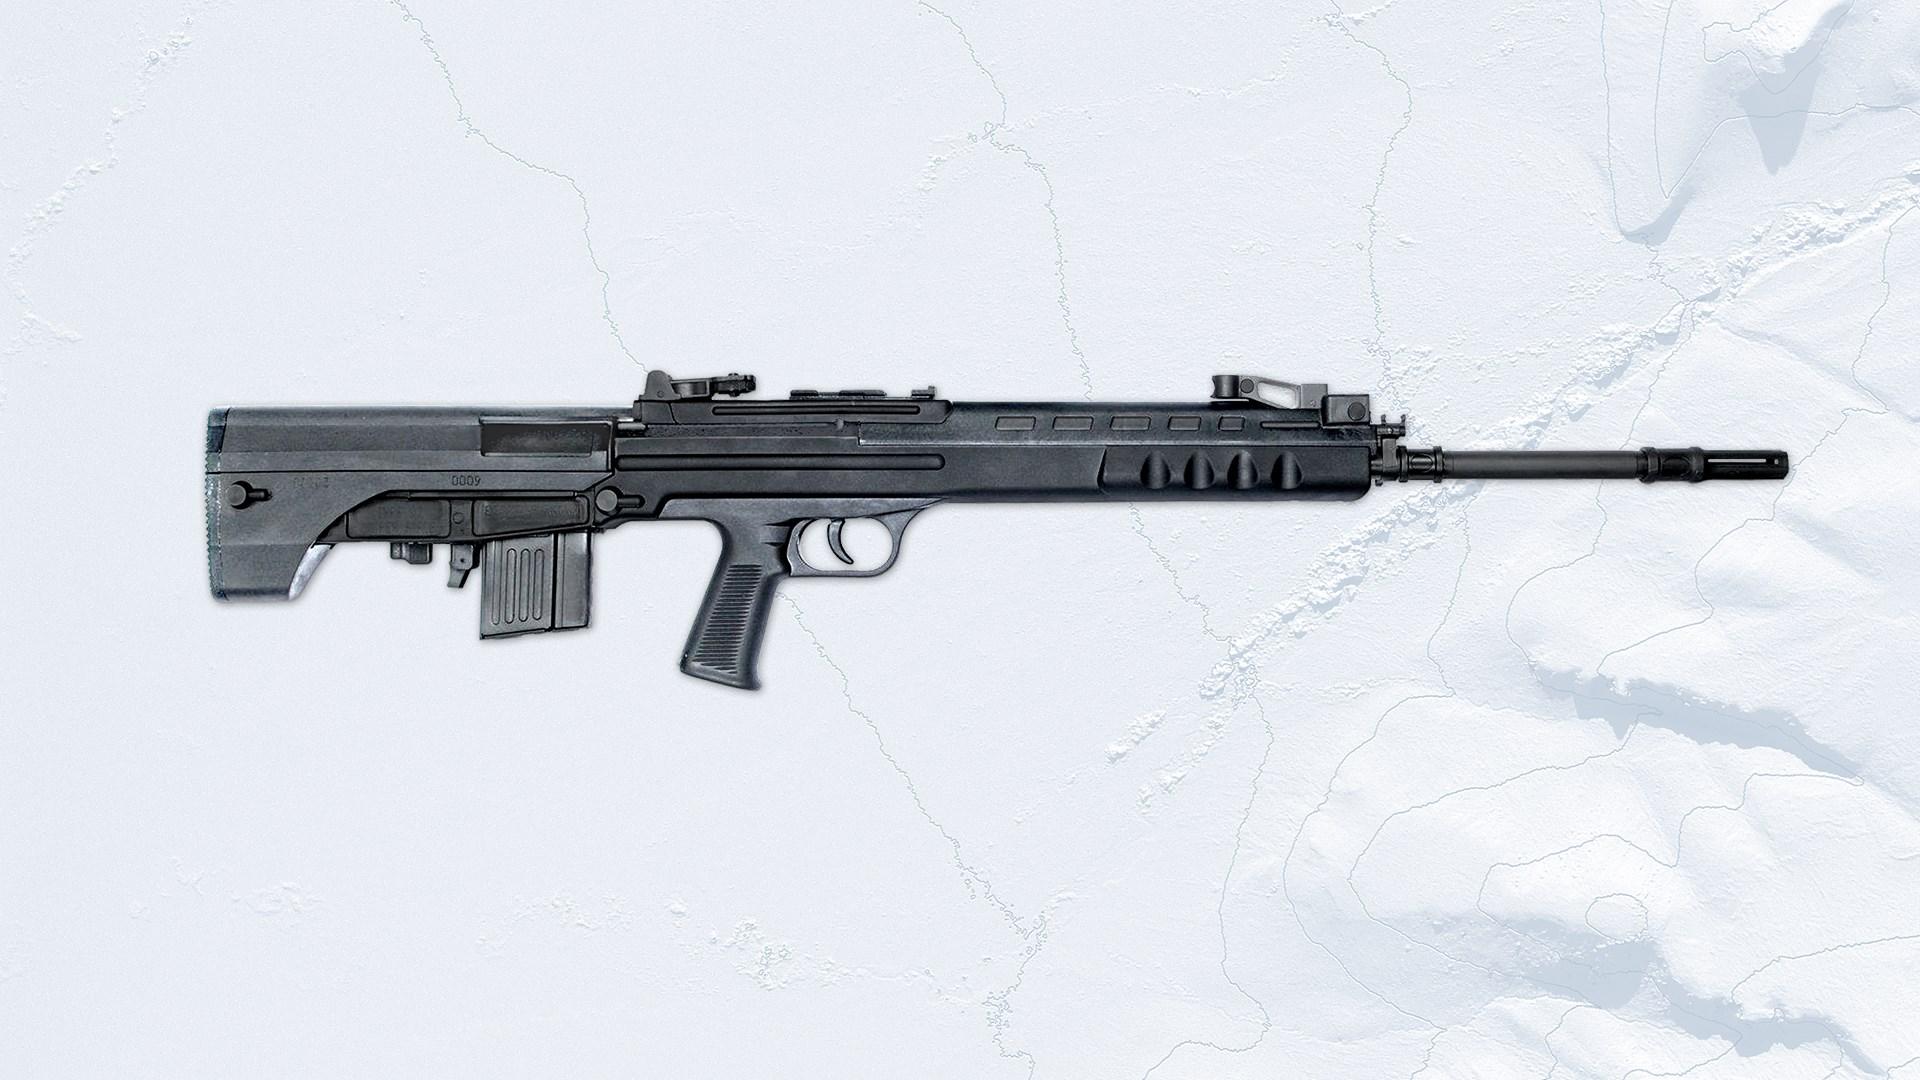 HUB-93